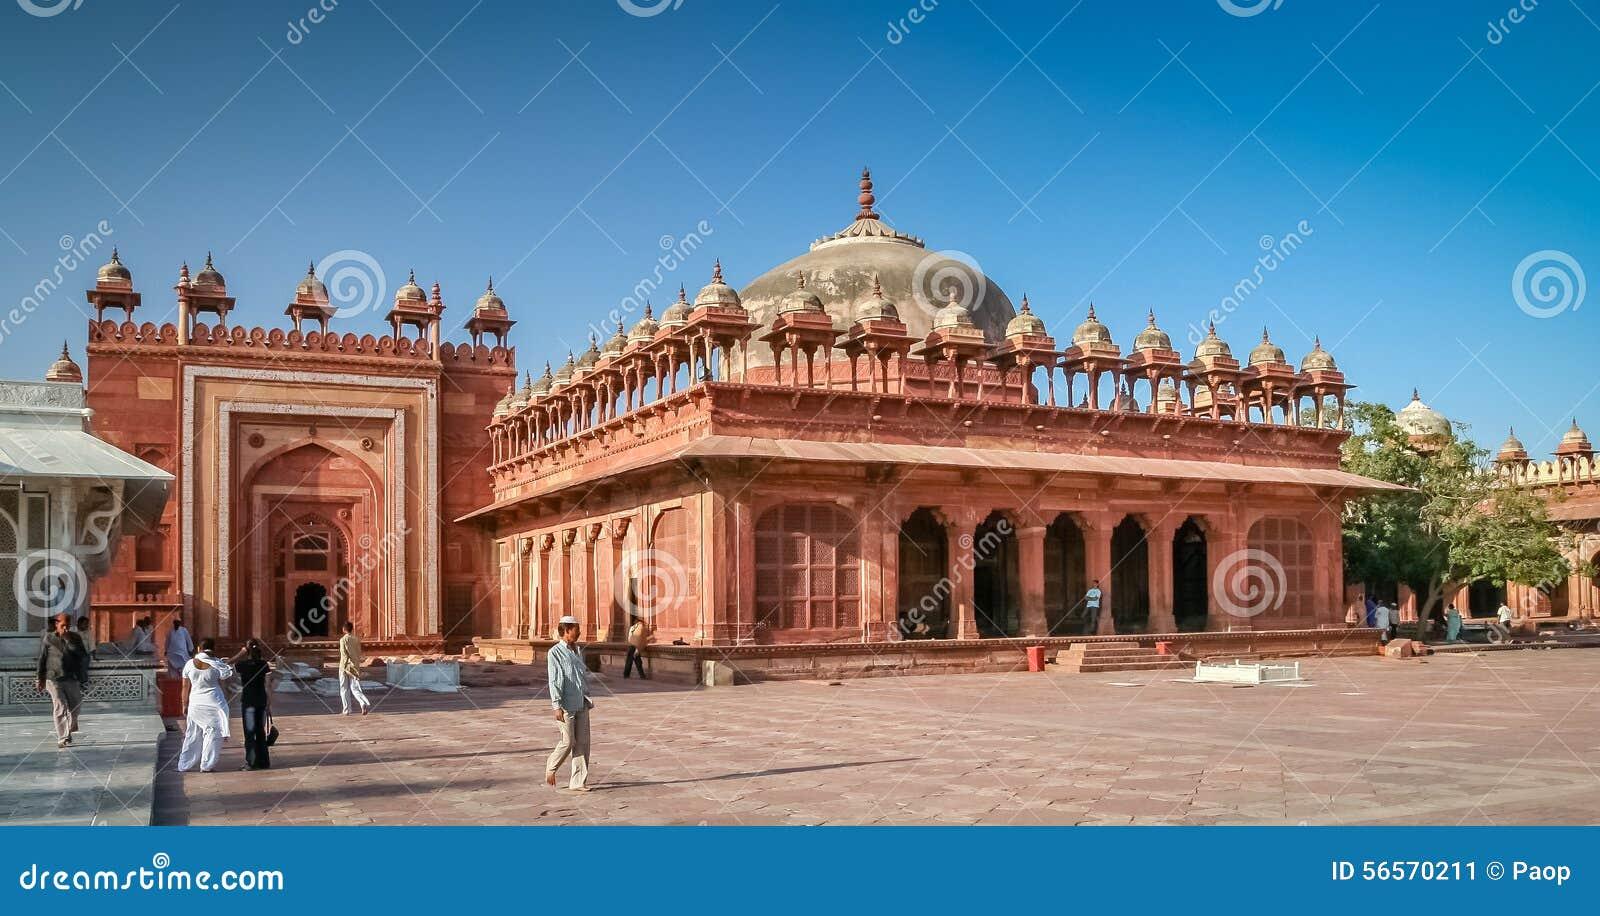 Download Προαύλιο Sikri Fatehpur εκδοτική εικόνες. εικόνα από έλξη - 56570211